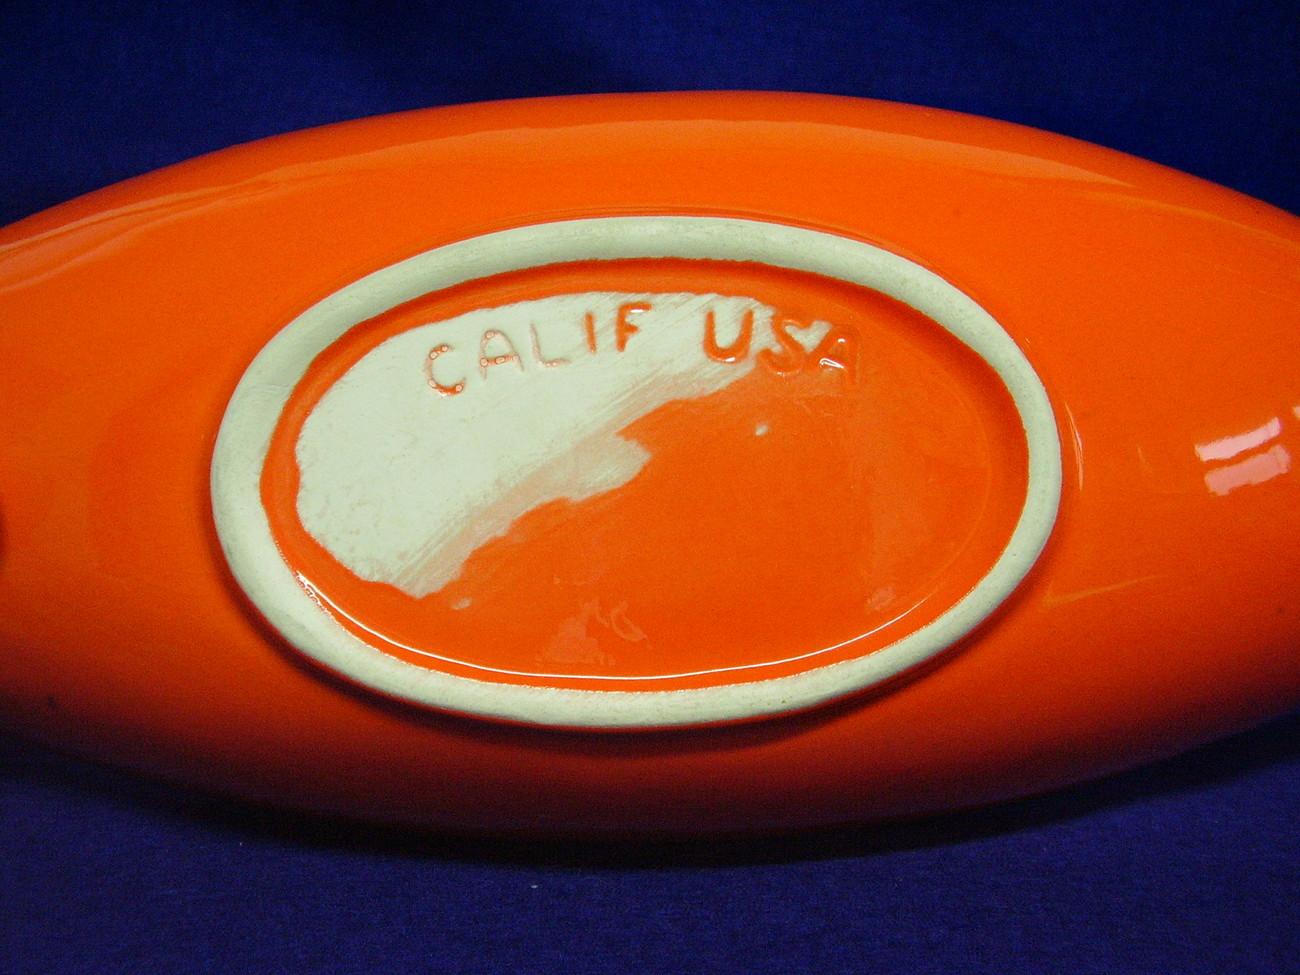 50's Eames California USA Orange Gold Canoe Boat Dish